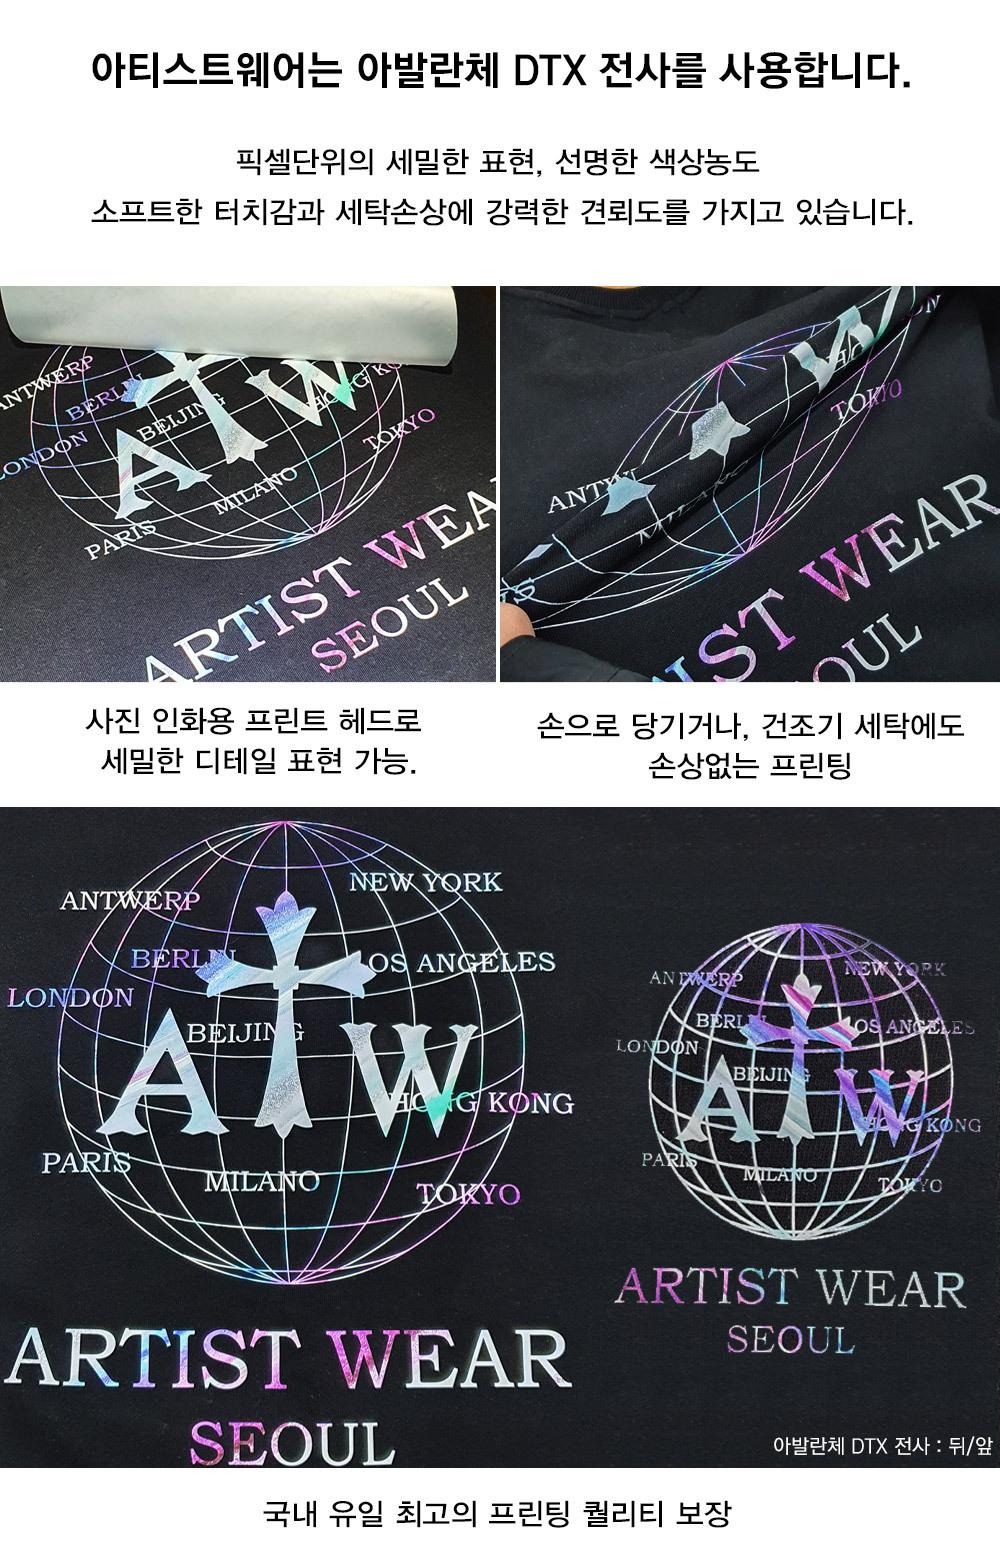 ATW_DTX.jpg